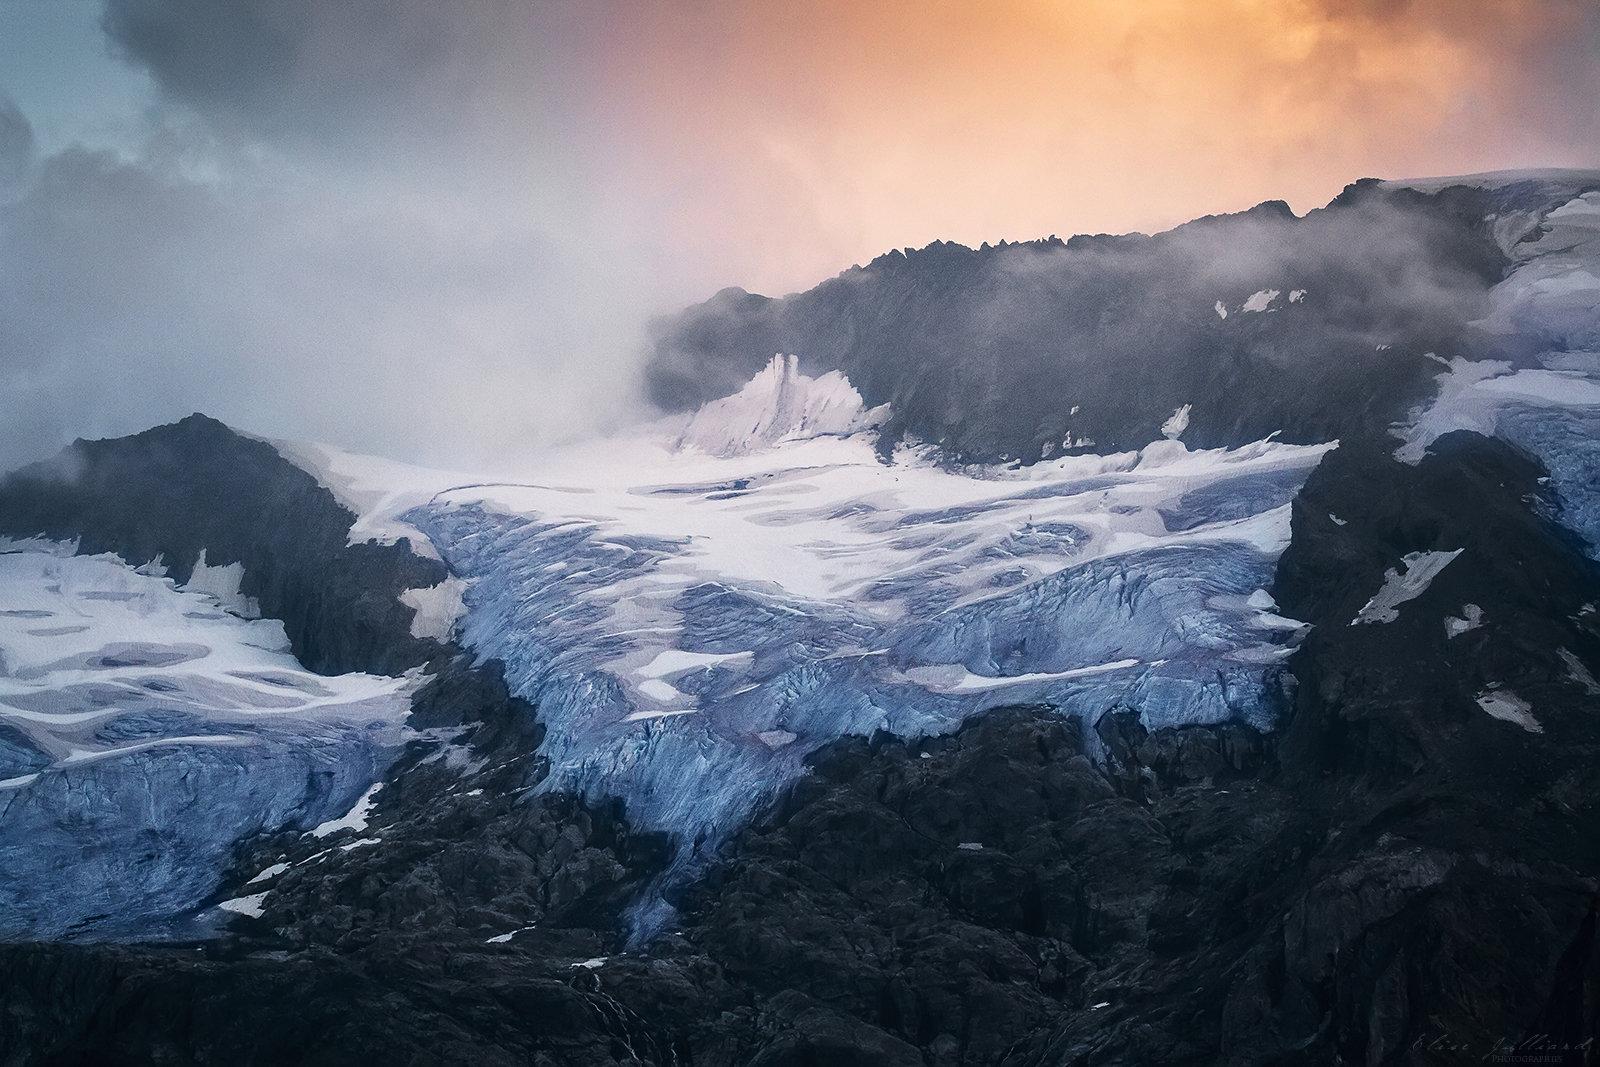 elise-julliard-photographe-photo-paysage-glacier-volnet-savoie-tarentaise